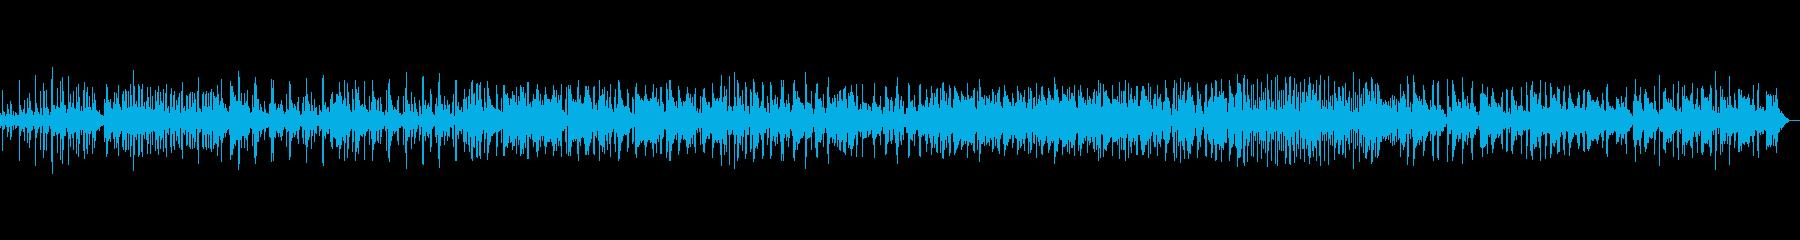 FIFE AND DRUMS、音楽...の再生済みの波形